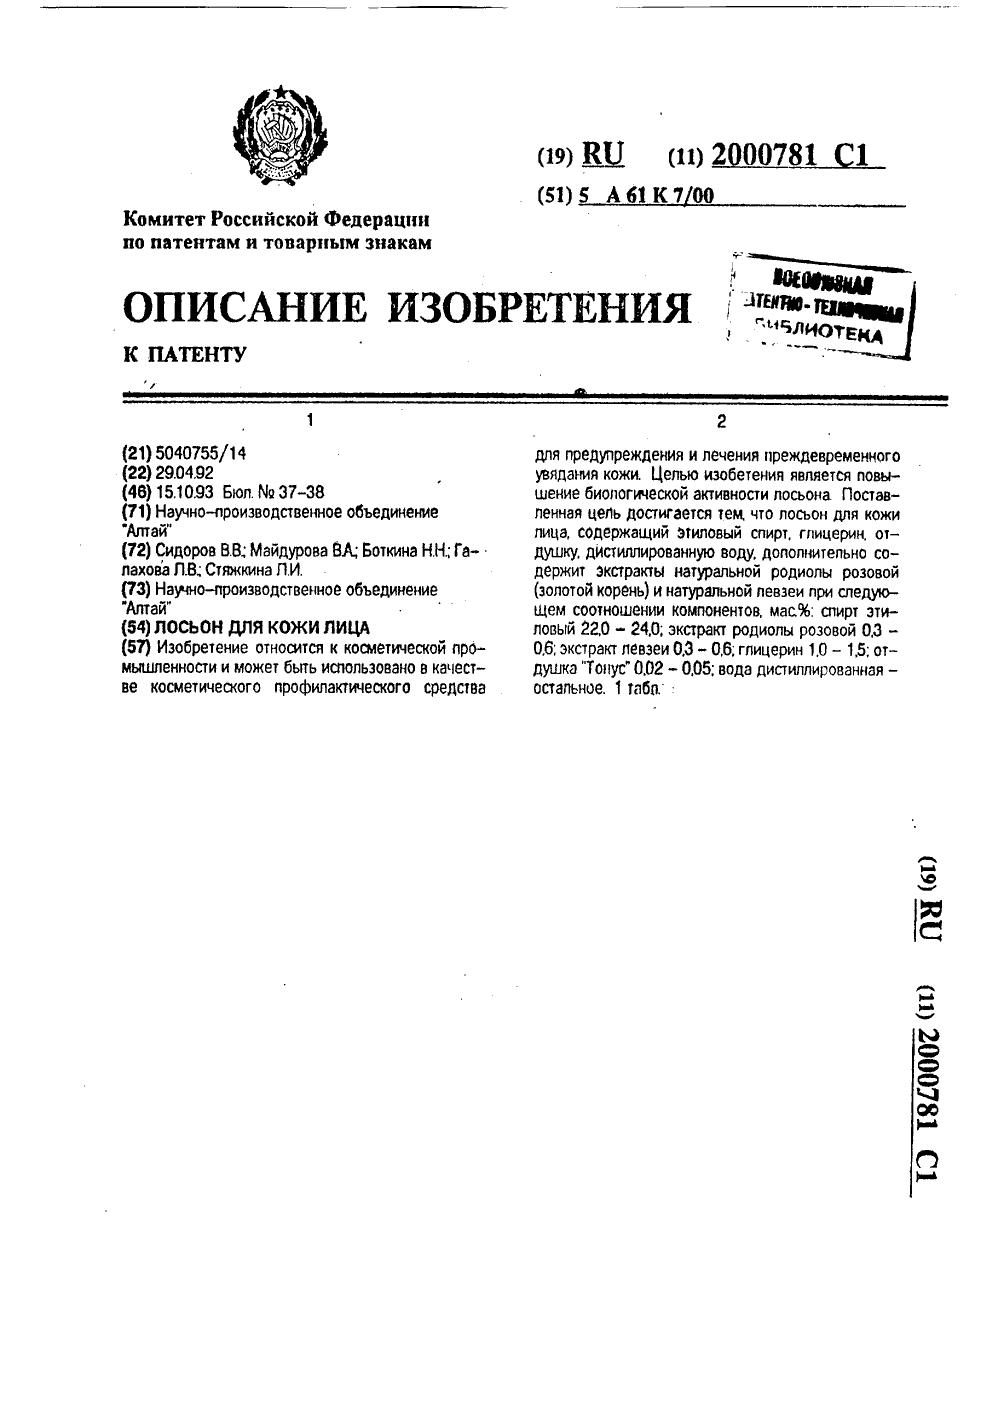 2-cyclohexen-1-one,2,2-(2-nitrophenyl)methylene bis 3-hydroxy-5,5-dimethyl- c23h27no6 (cas 139484-04-1)